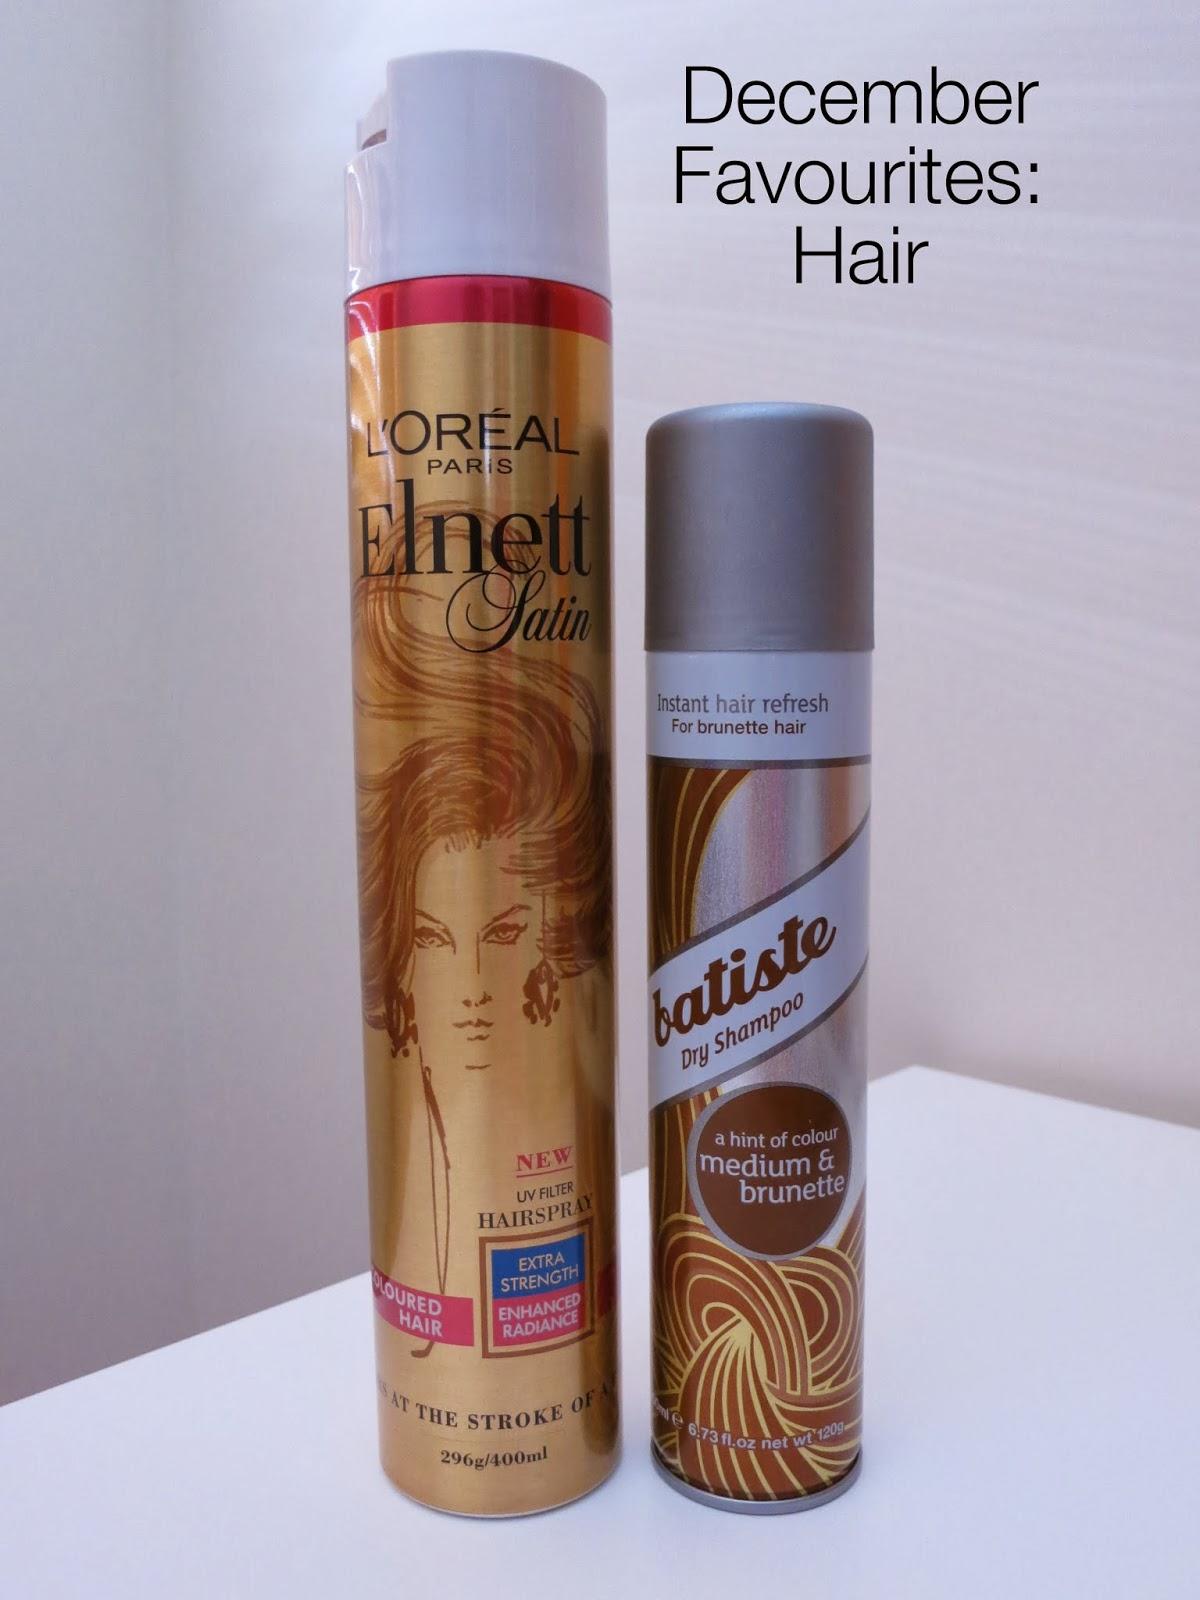 december beauty favourites, 2013 yearly favourites, hair favourites, loreal elnett hairspray, batiste dry shampoo